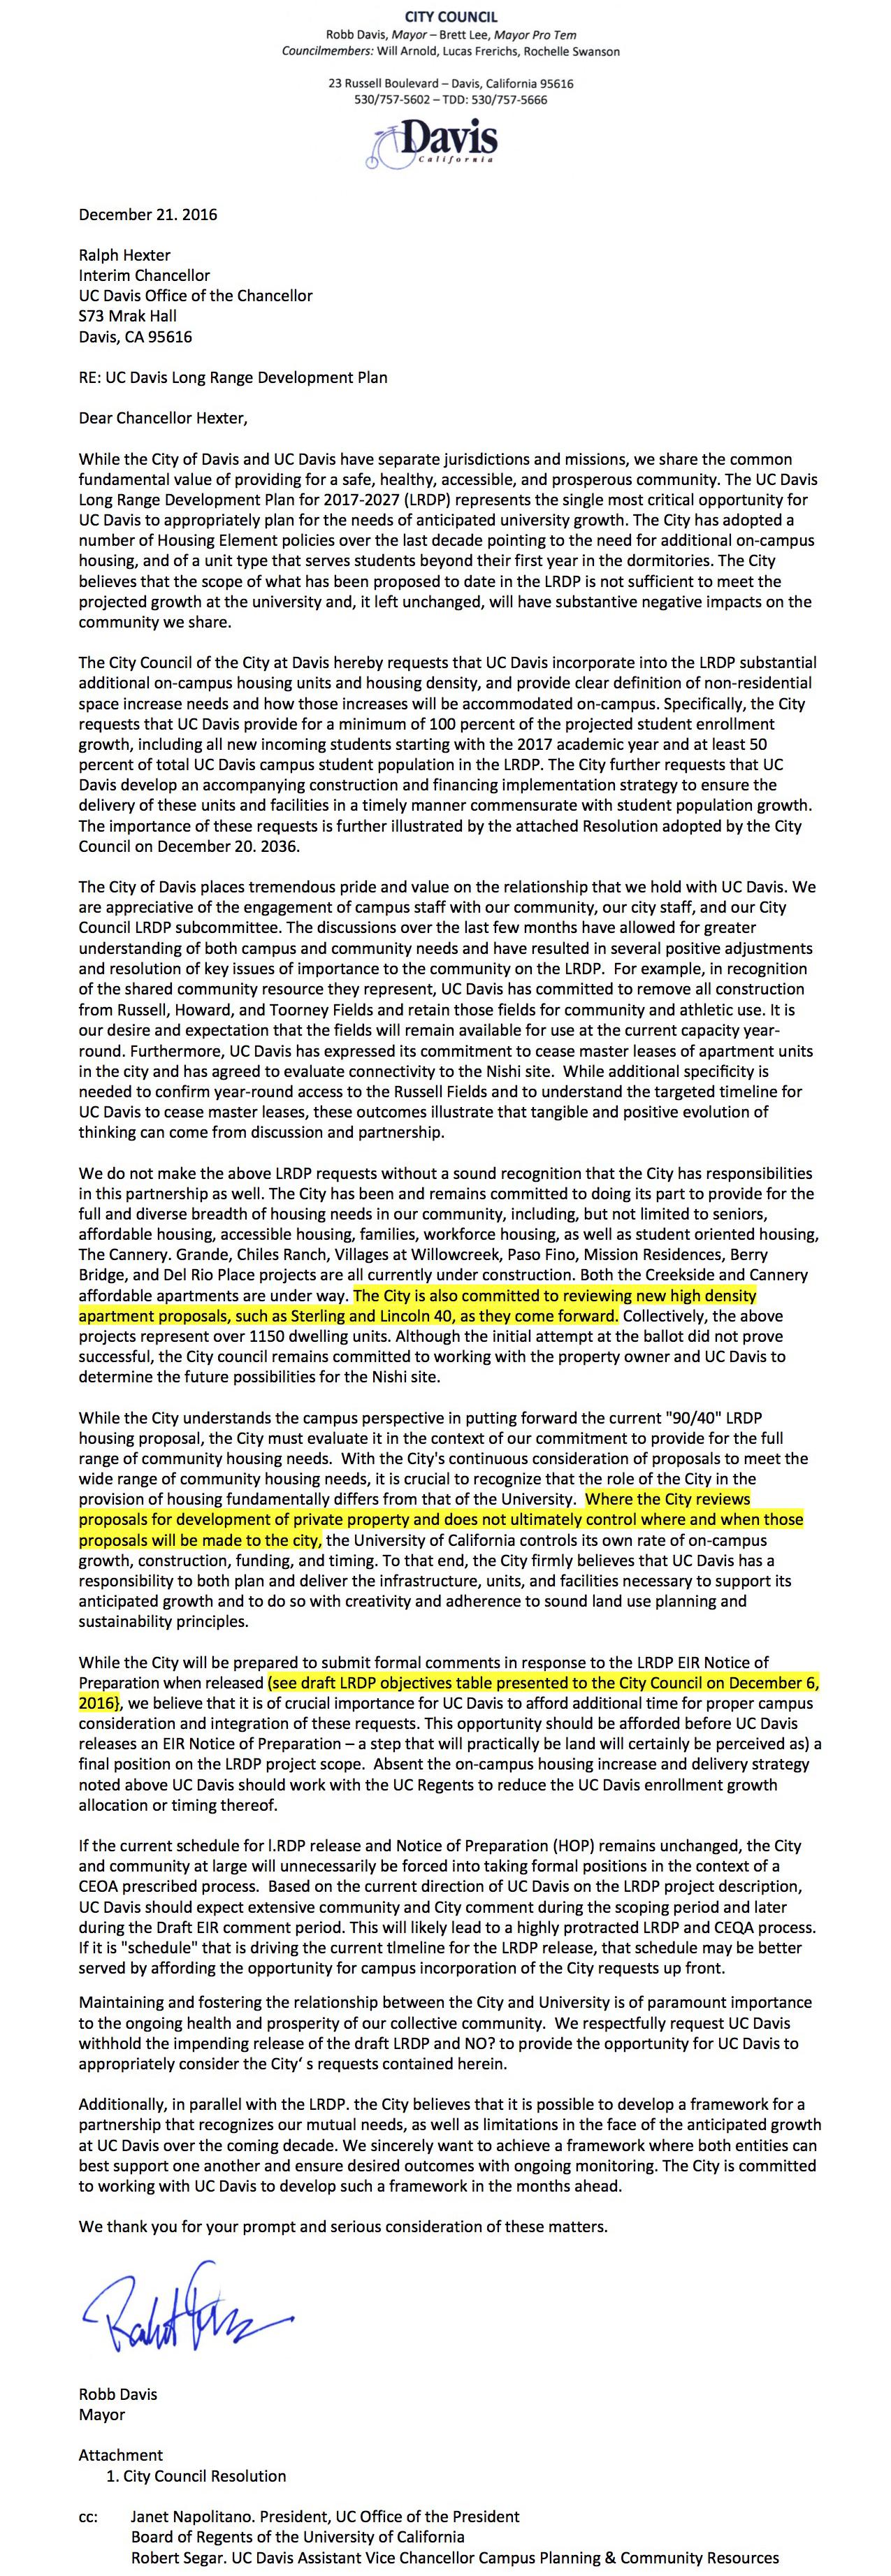 http://www.davisvanguard.org/wp-content/uploads/2017/04/2016-12-21-Davis-Letter-to-Hexter.jpg